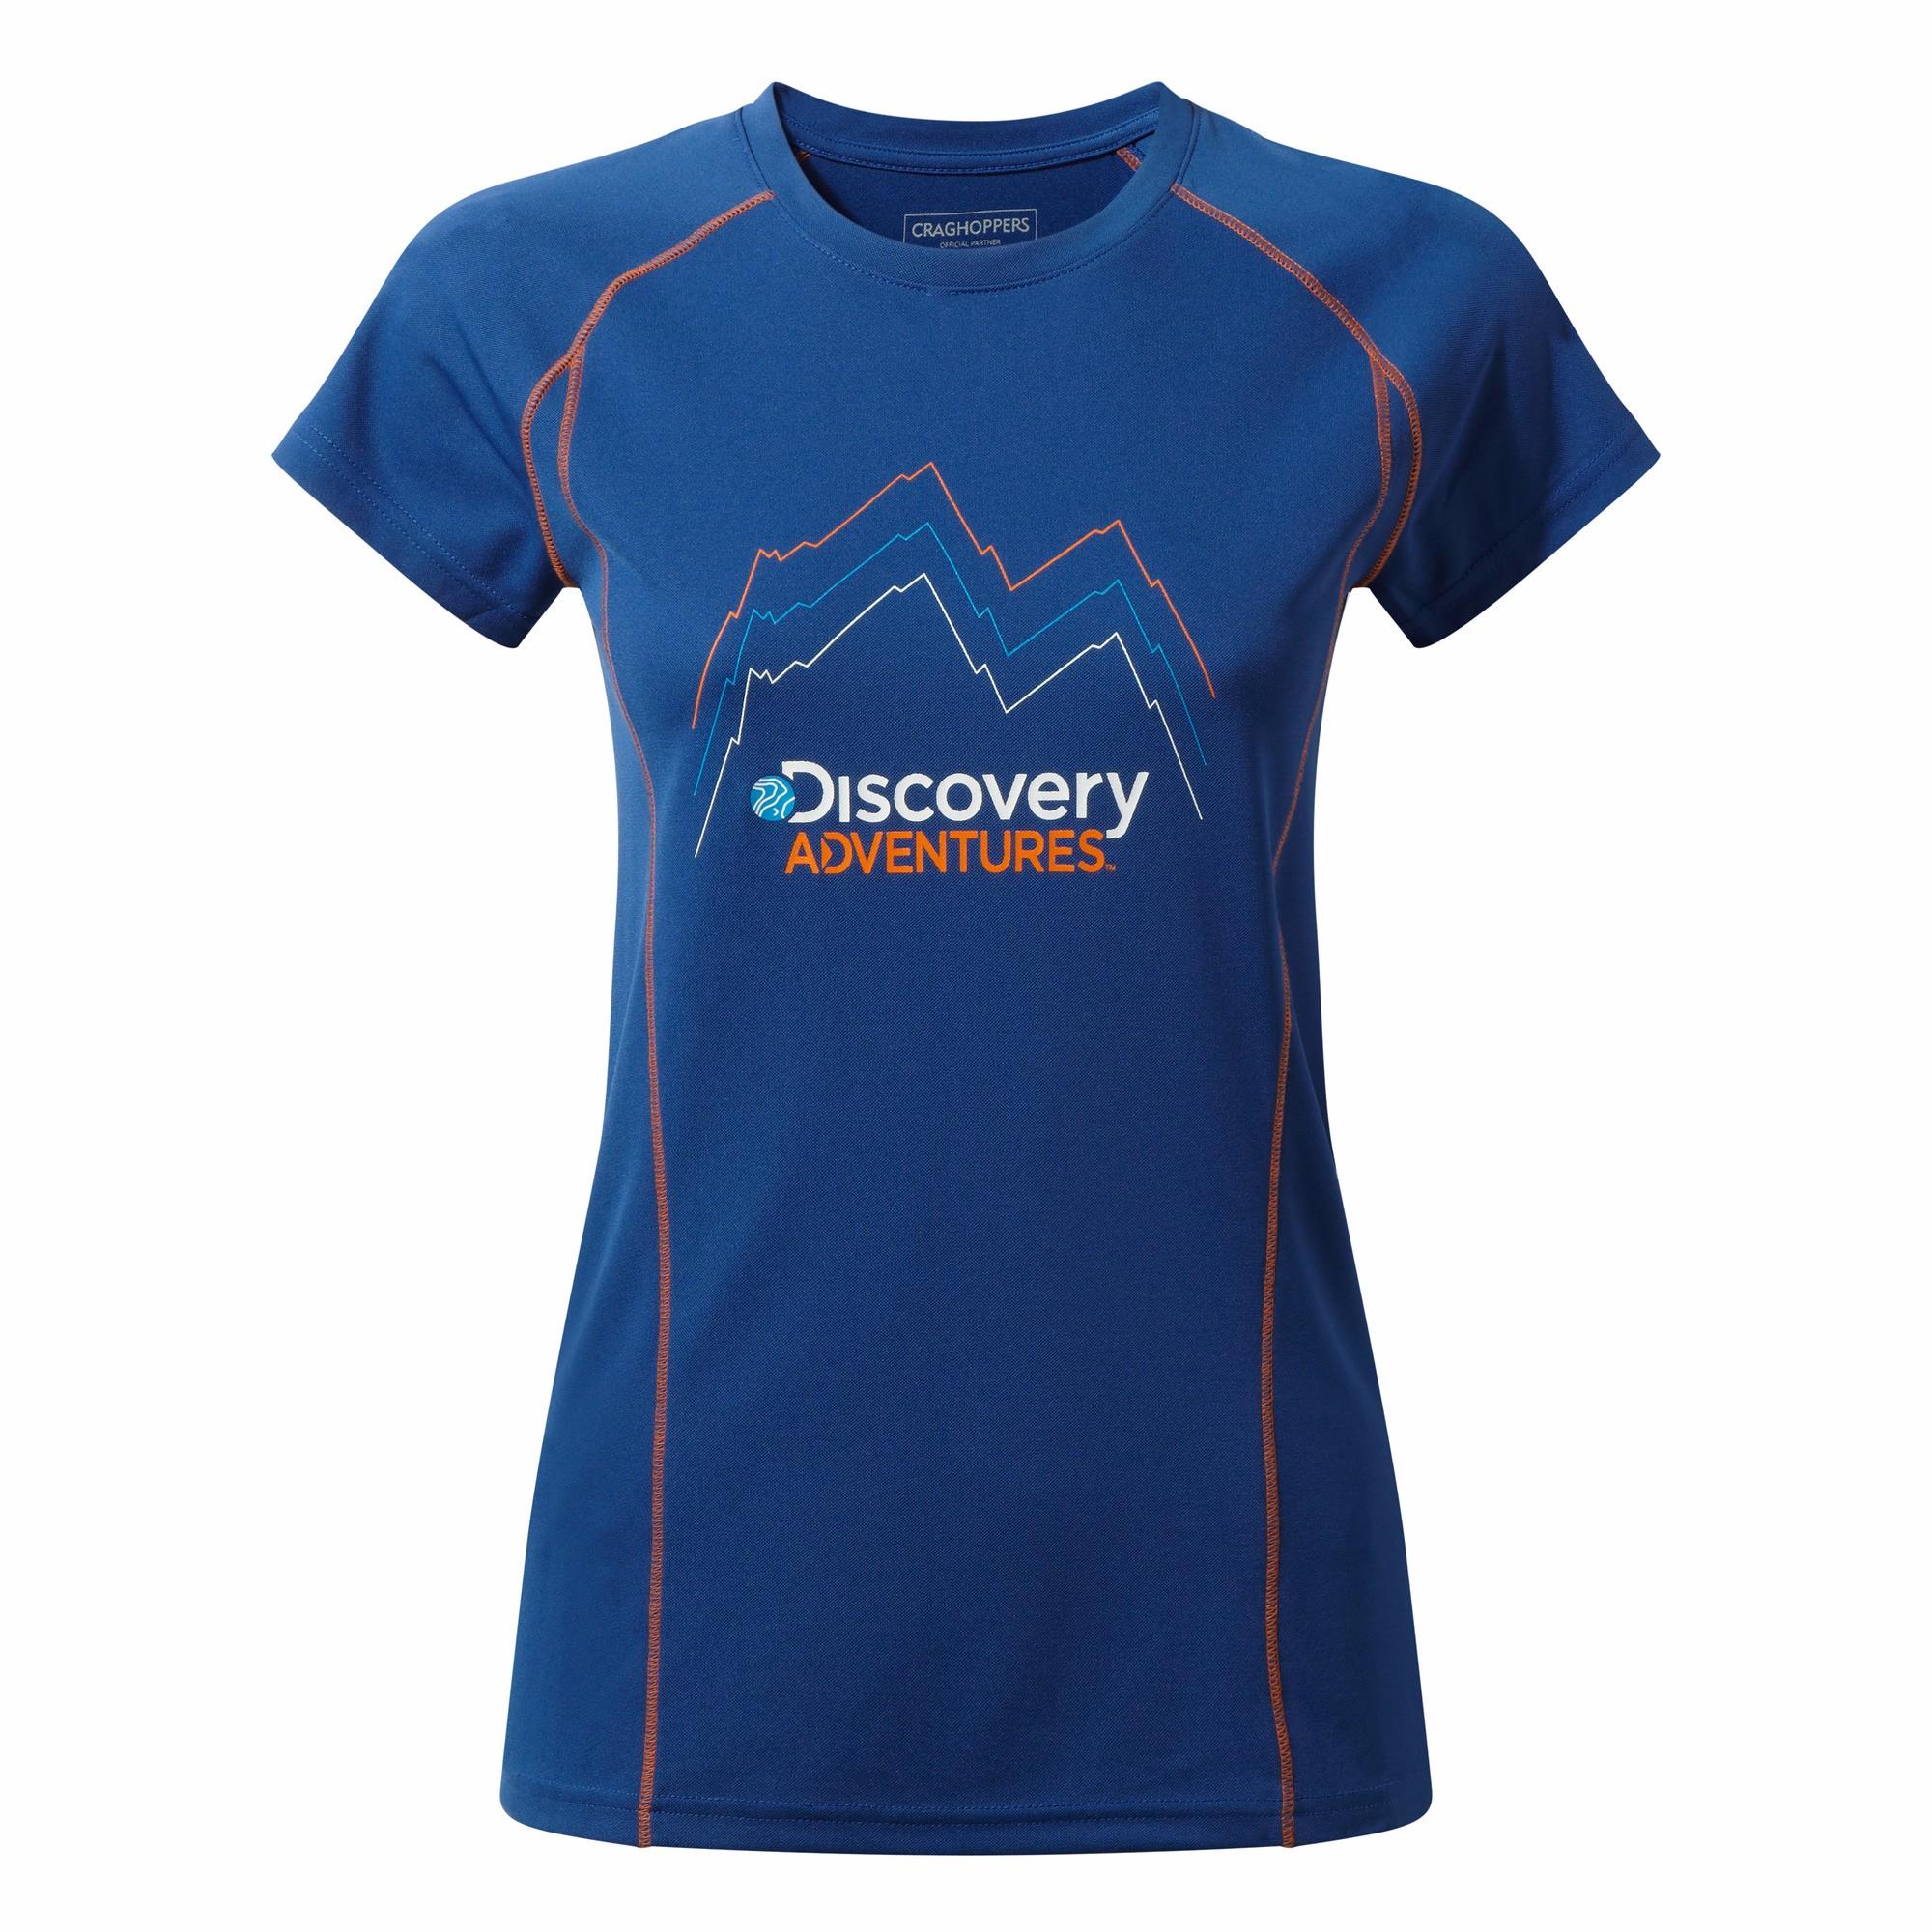 Craghoppers T-Shirt Damen Discovery Adventures leichtes Kurzarm